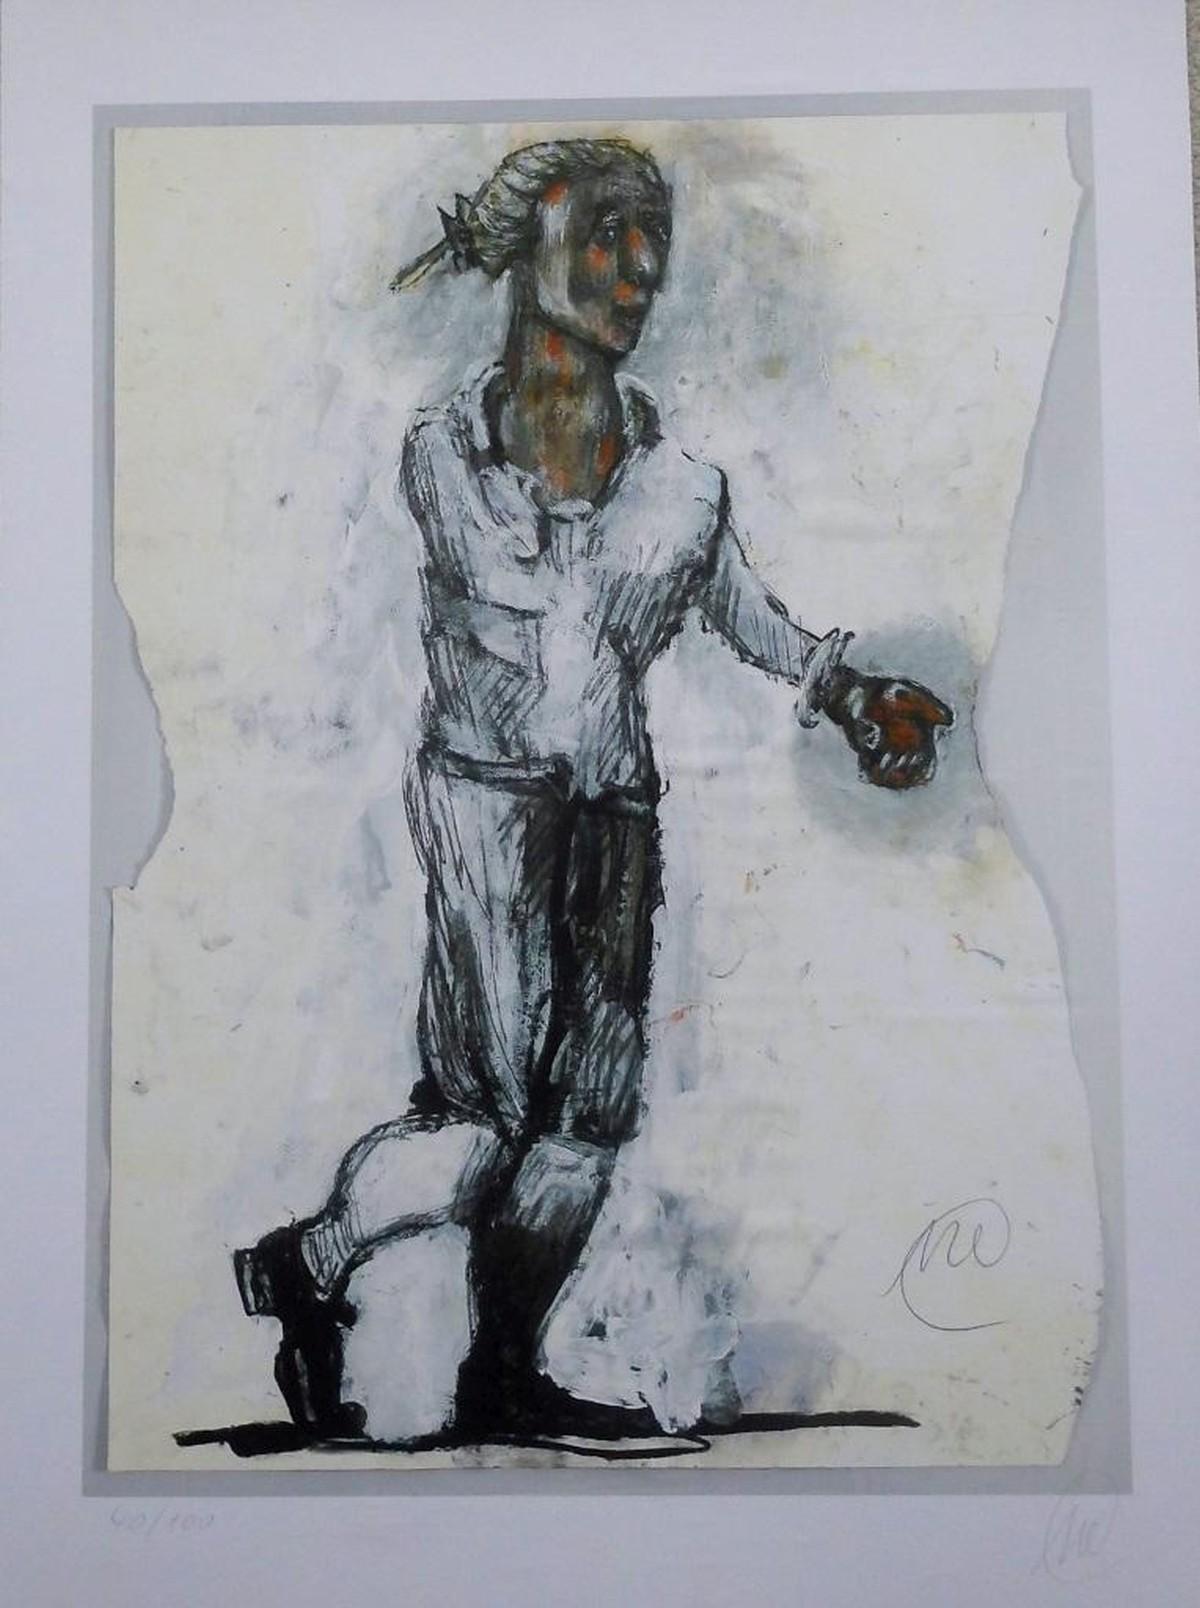 Marcus Lupertz - Mozart, digitale Seriegrafie von 2006 kopen? Bied vanaf 550!